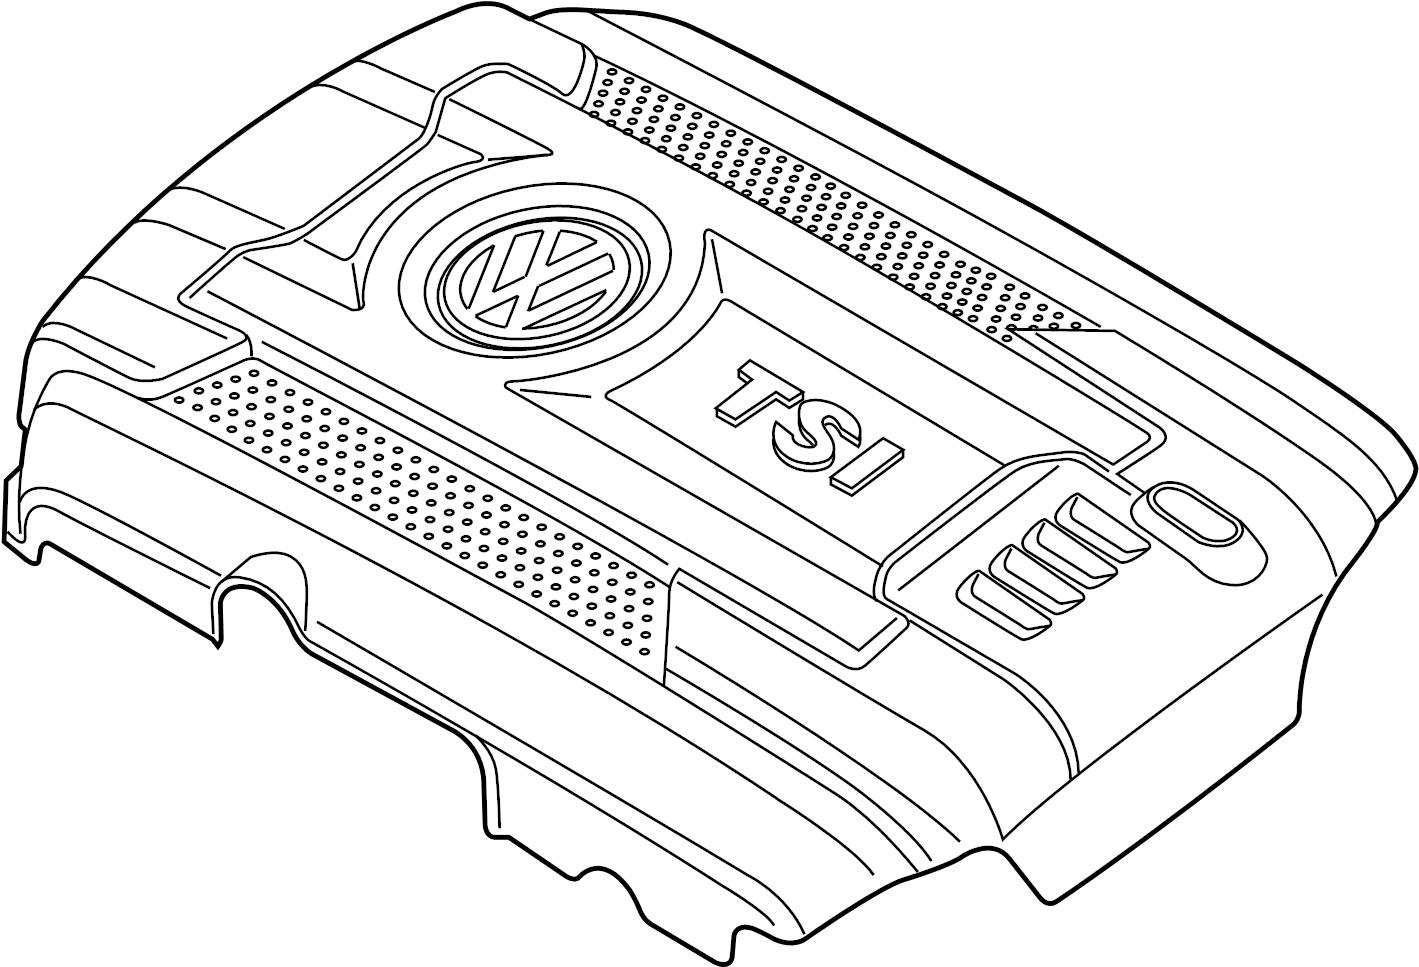 Diagram Of 2005 Motorguide Trolling Motor 921310070 Wire Diagrammodel